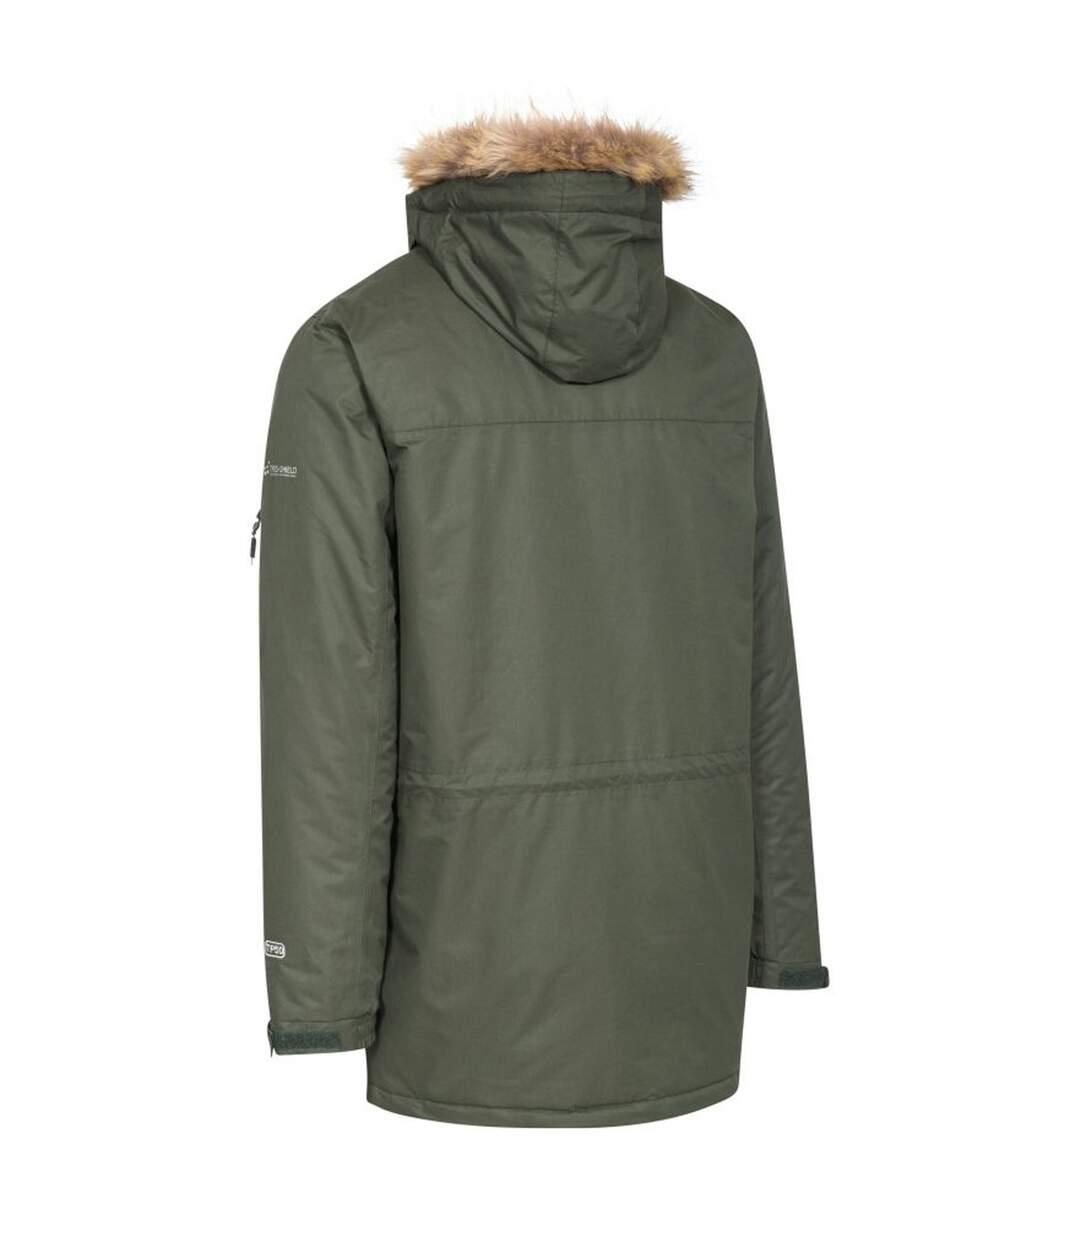 Trespass Mens Jaydin Waterproof Jacket (Blue) - UTTP3571